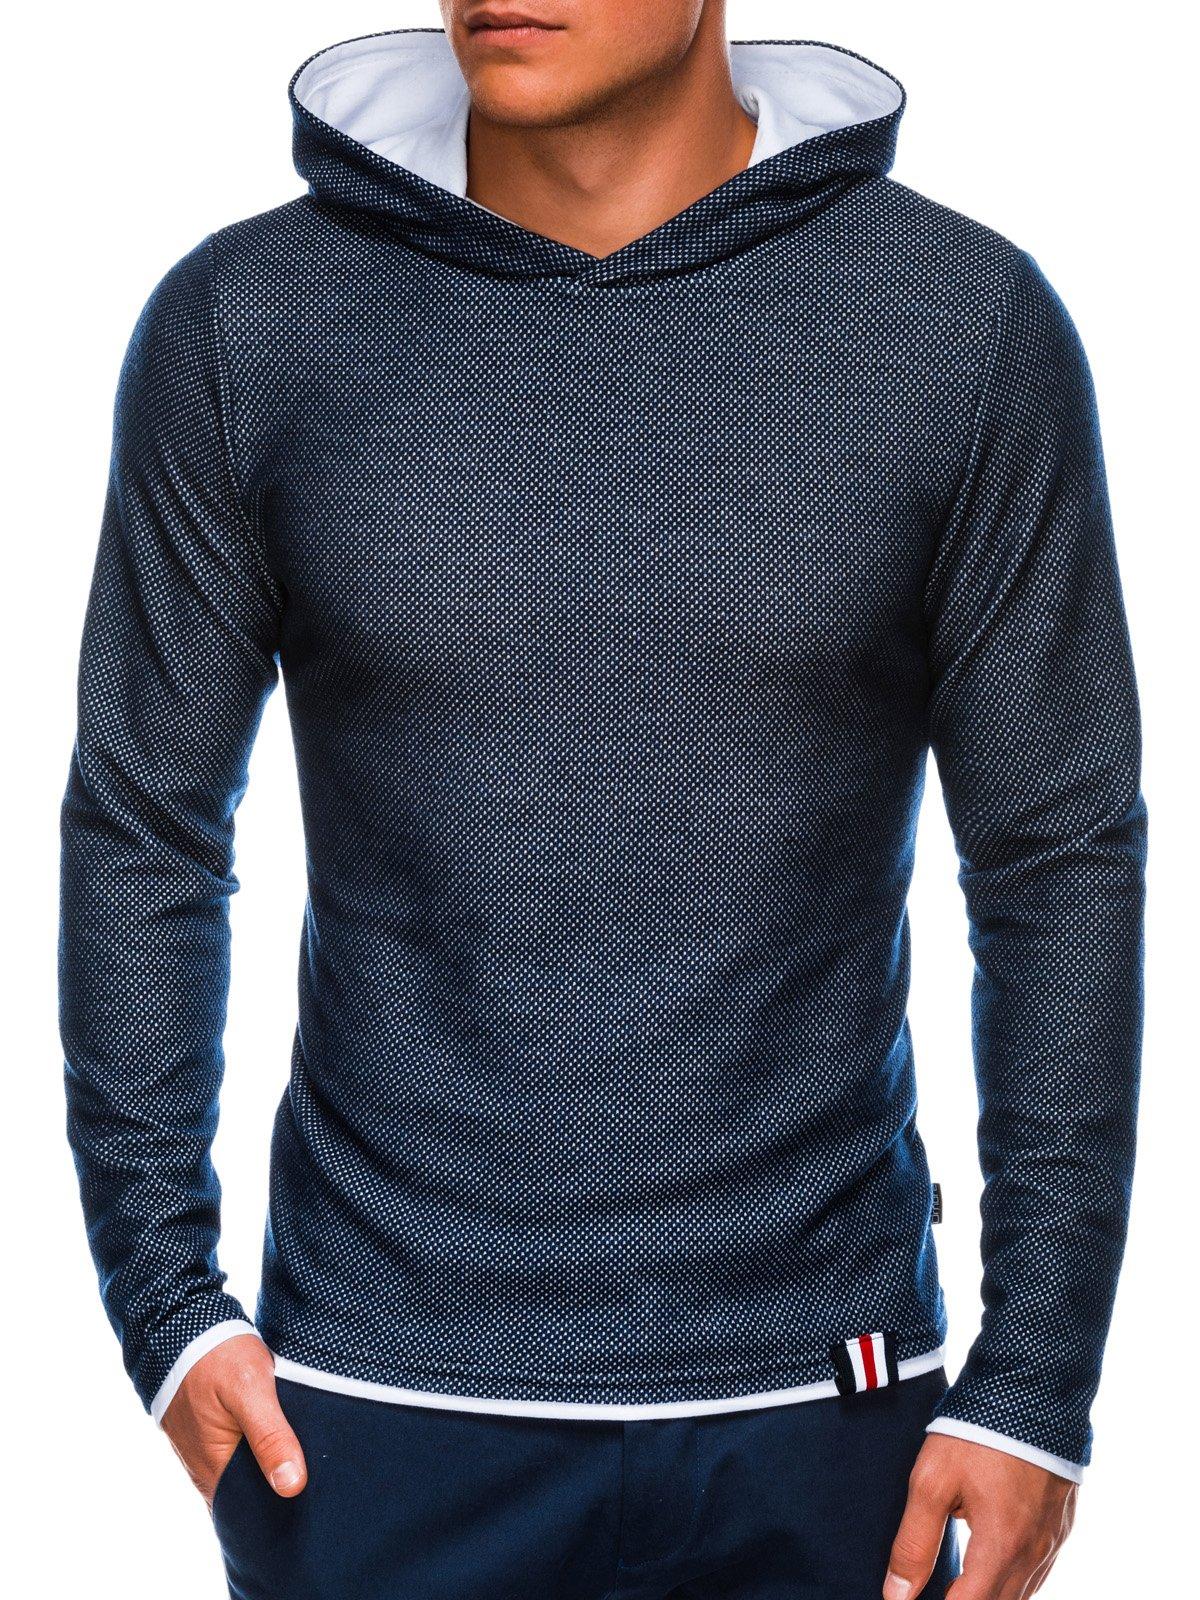 Купить Толстовка чоловіча з капюшоном B698 – темно-синя, Ombre Clothing